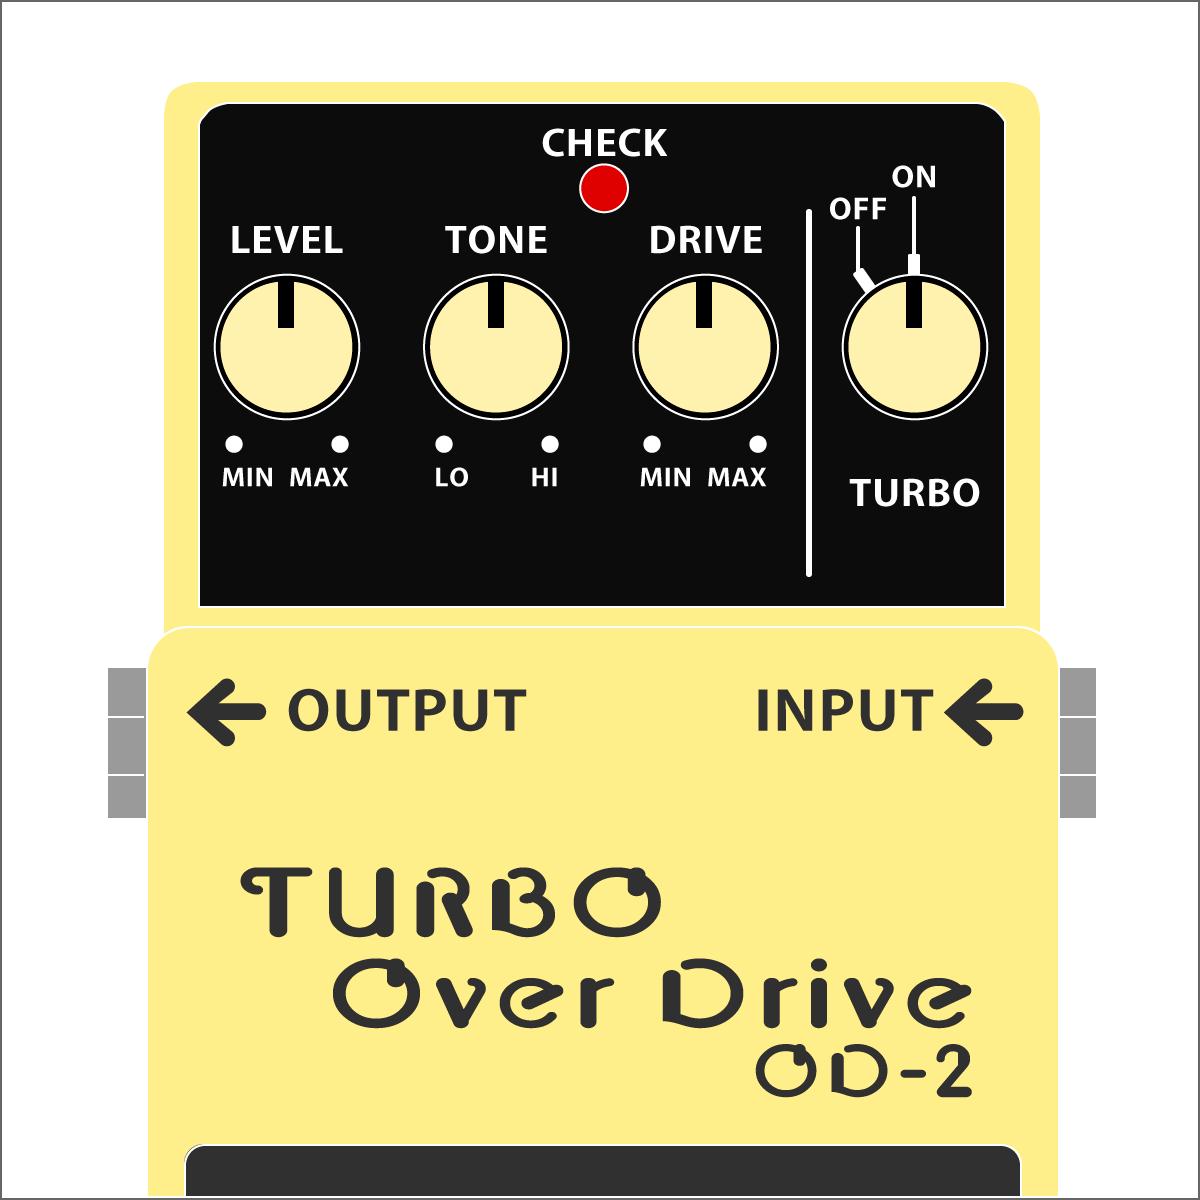 OD-2 TURBO OverDrive(ターボオーバードライブ)